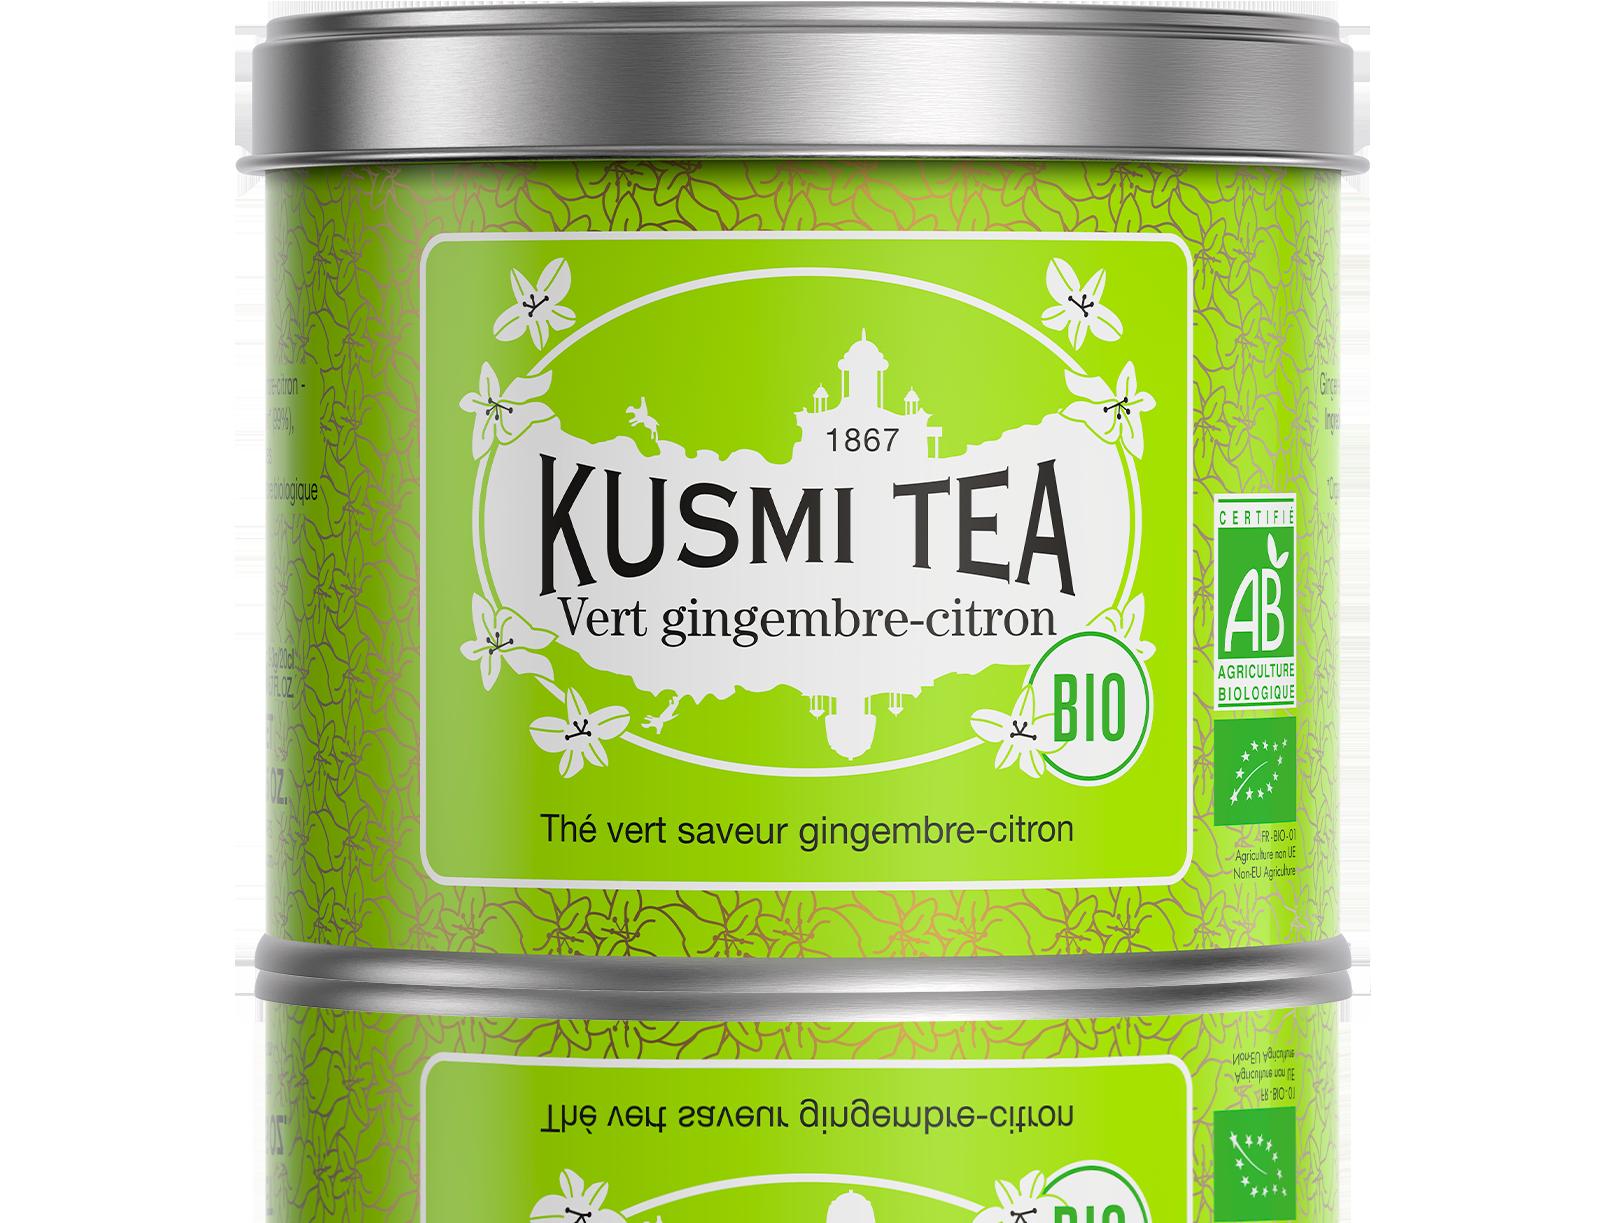 Thé vert - Vert gingembre-citron bio - Vrac - Kusmi Tea